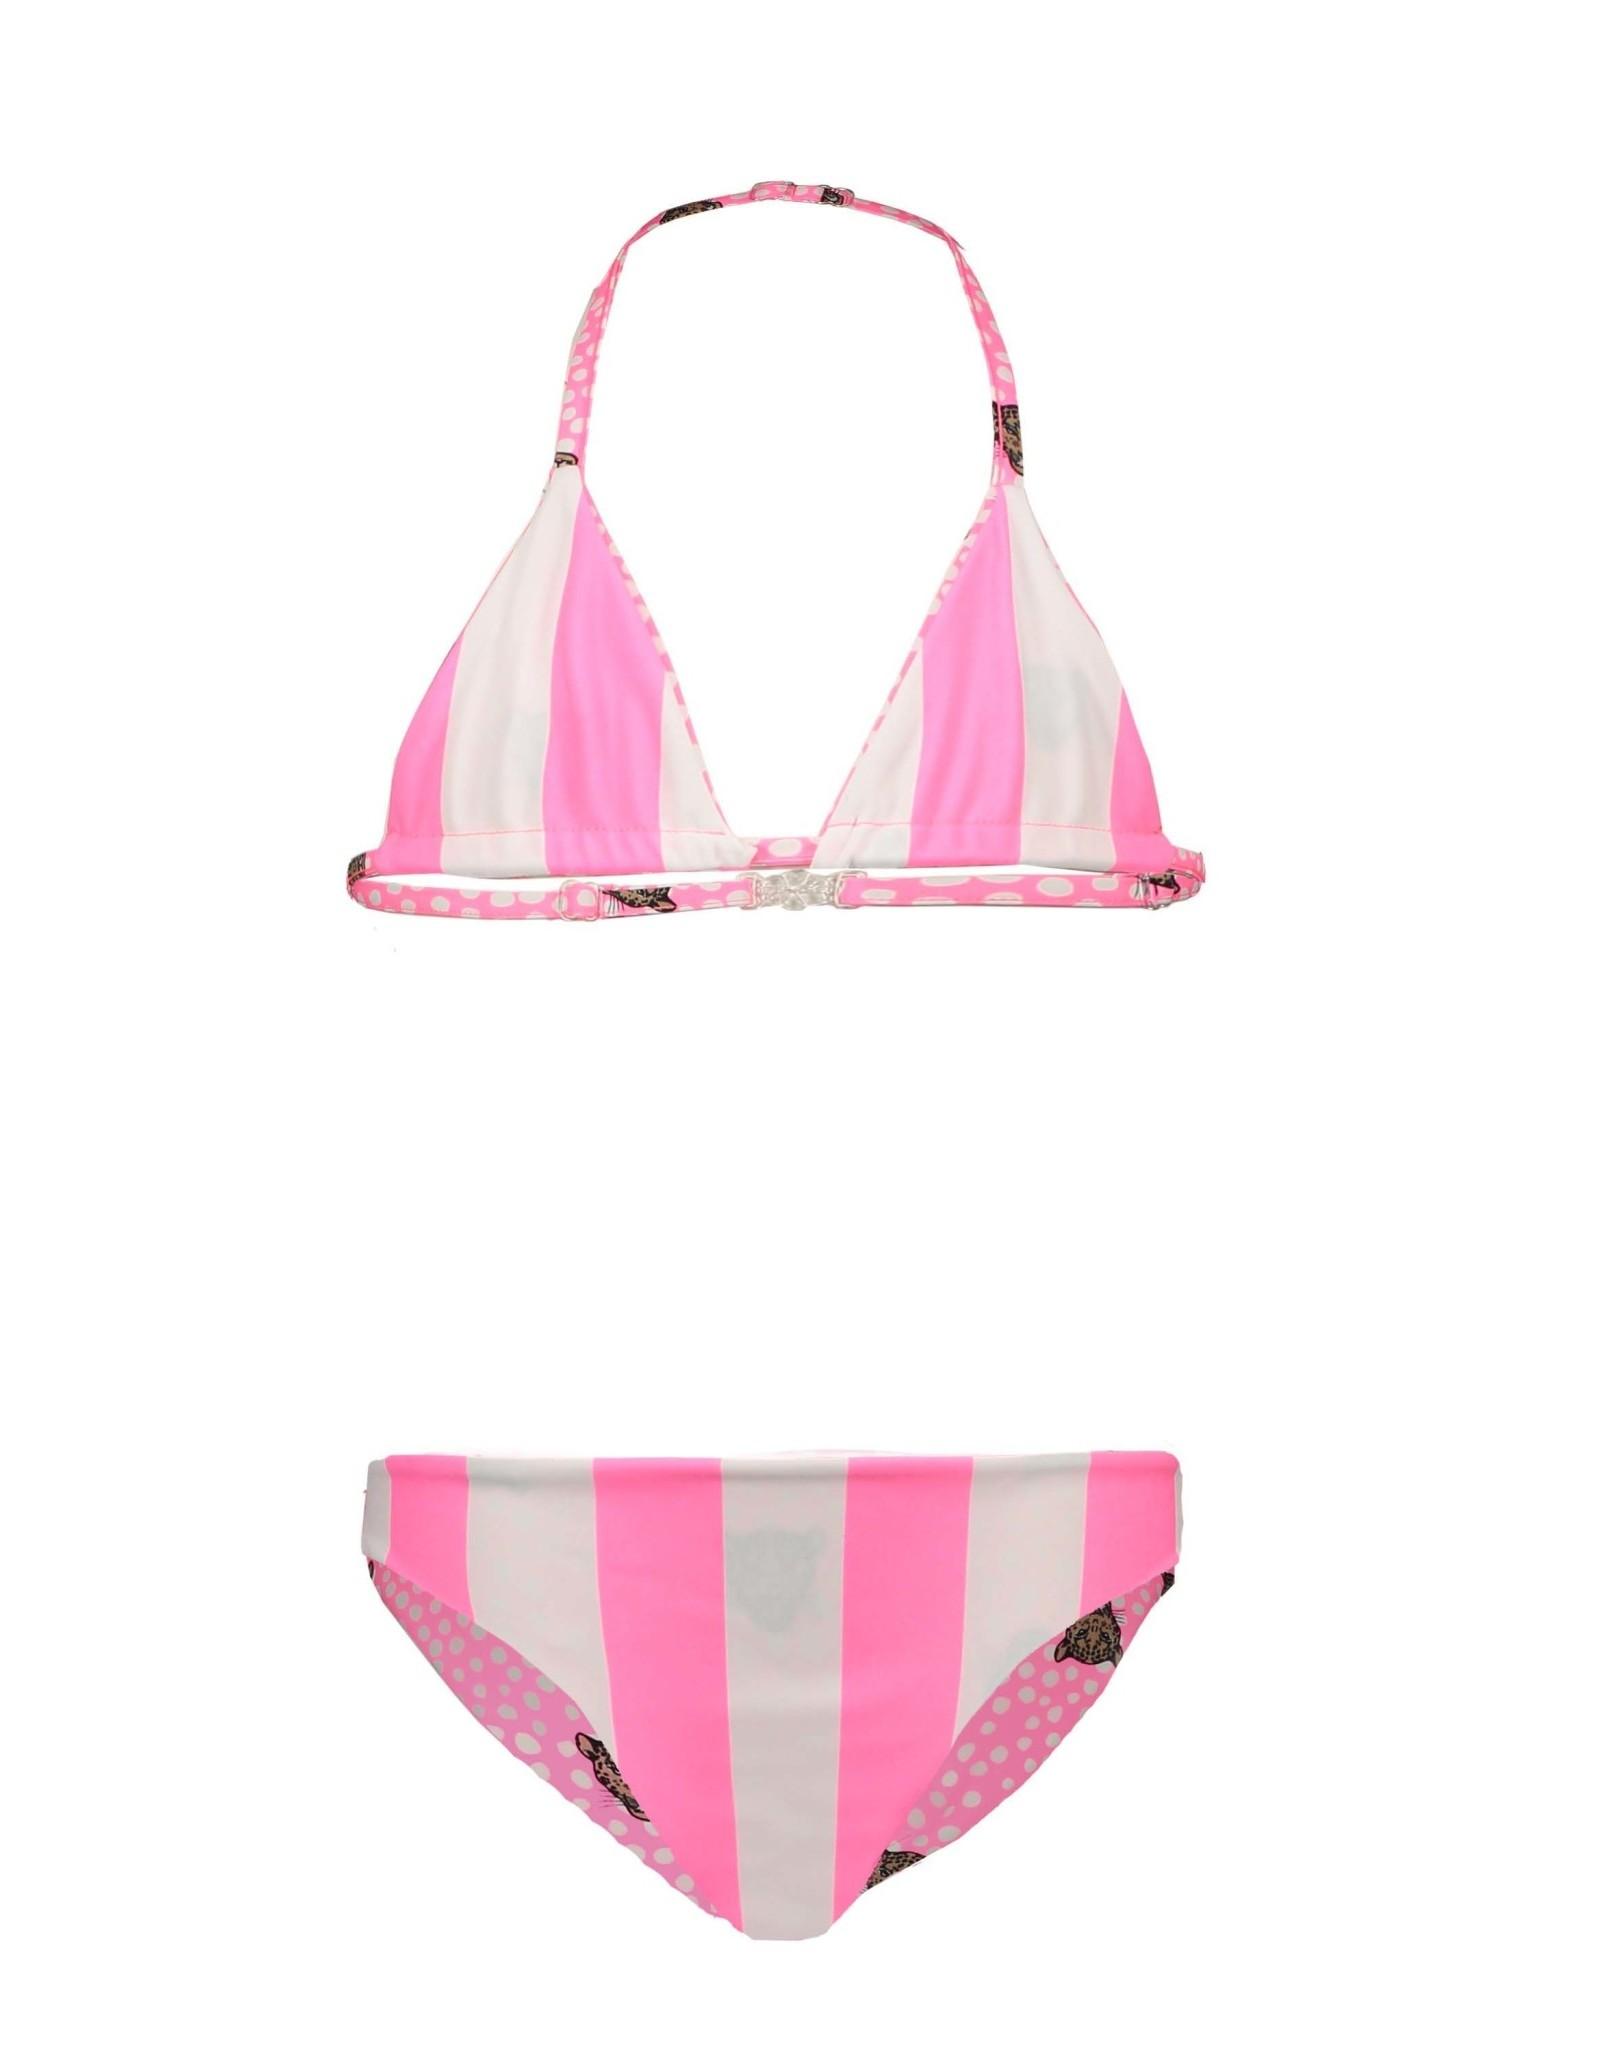 B-Nosy bikini triangel reversibel